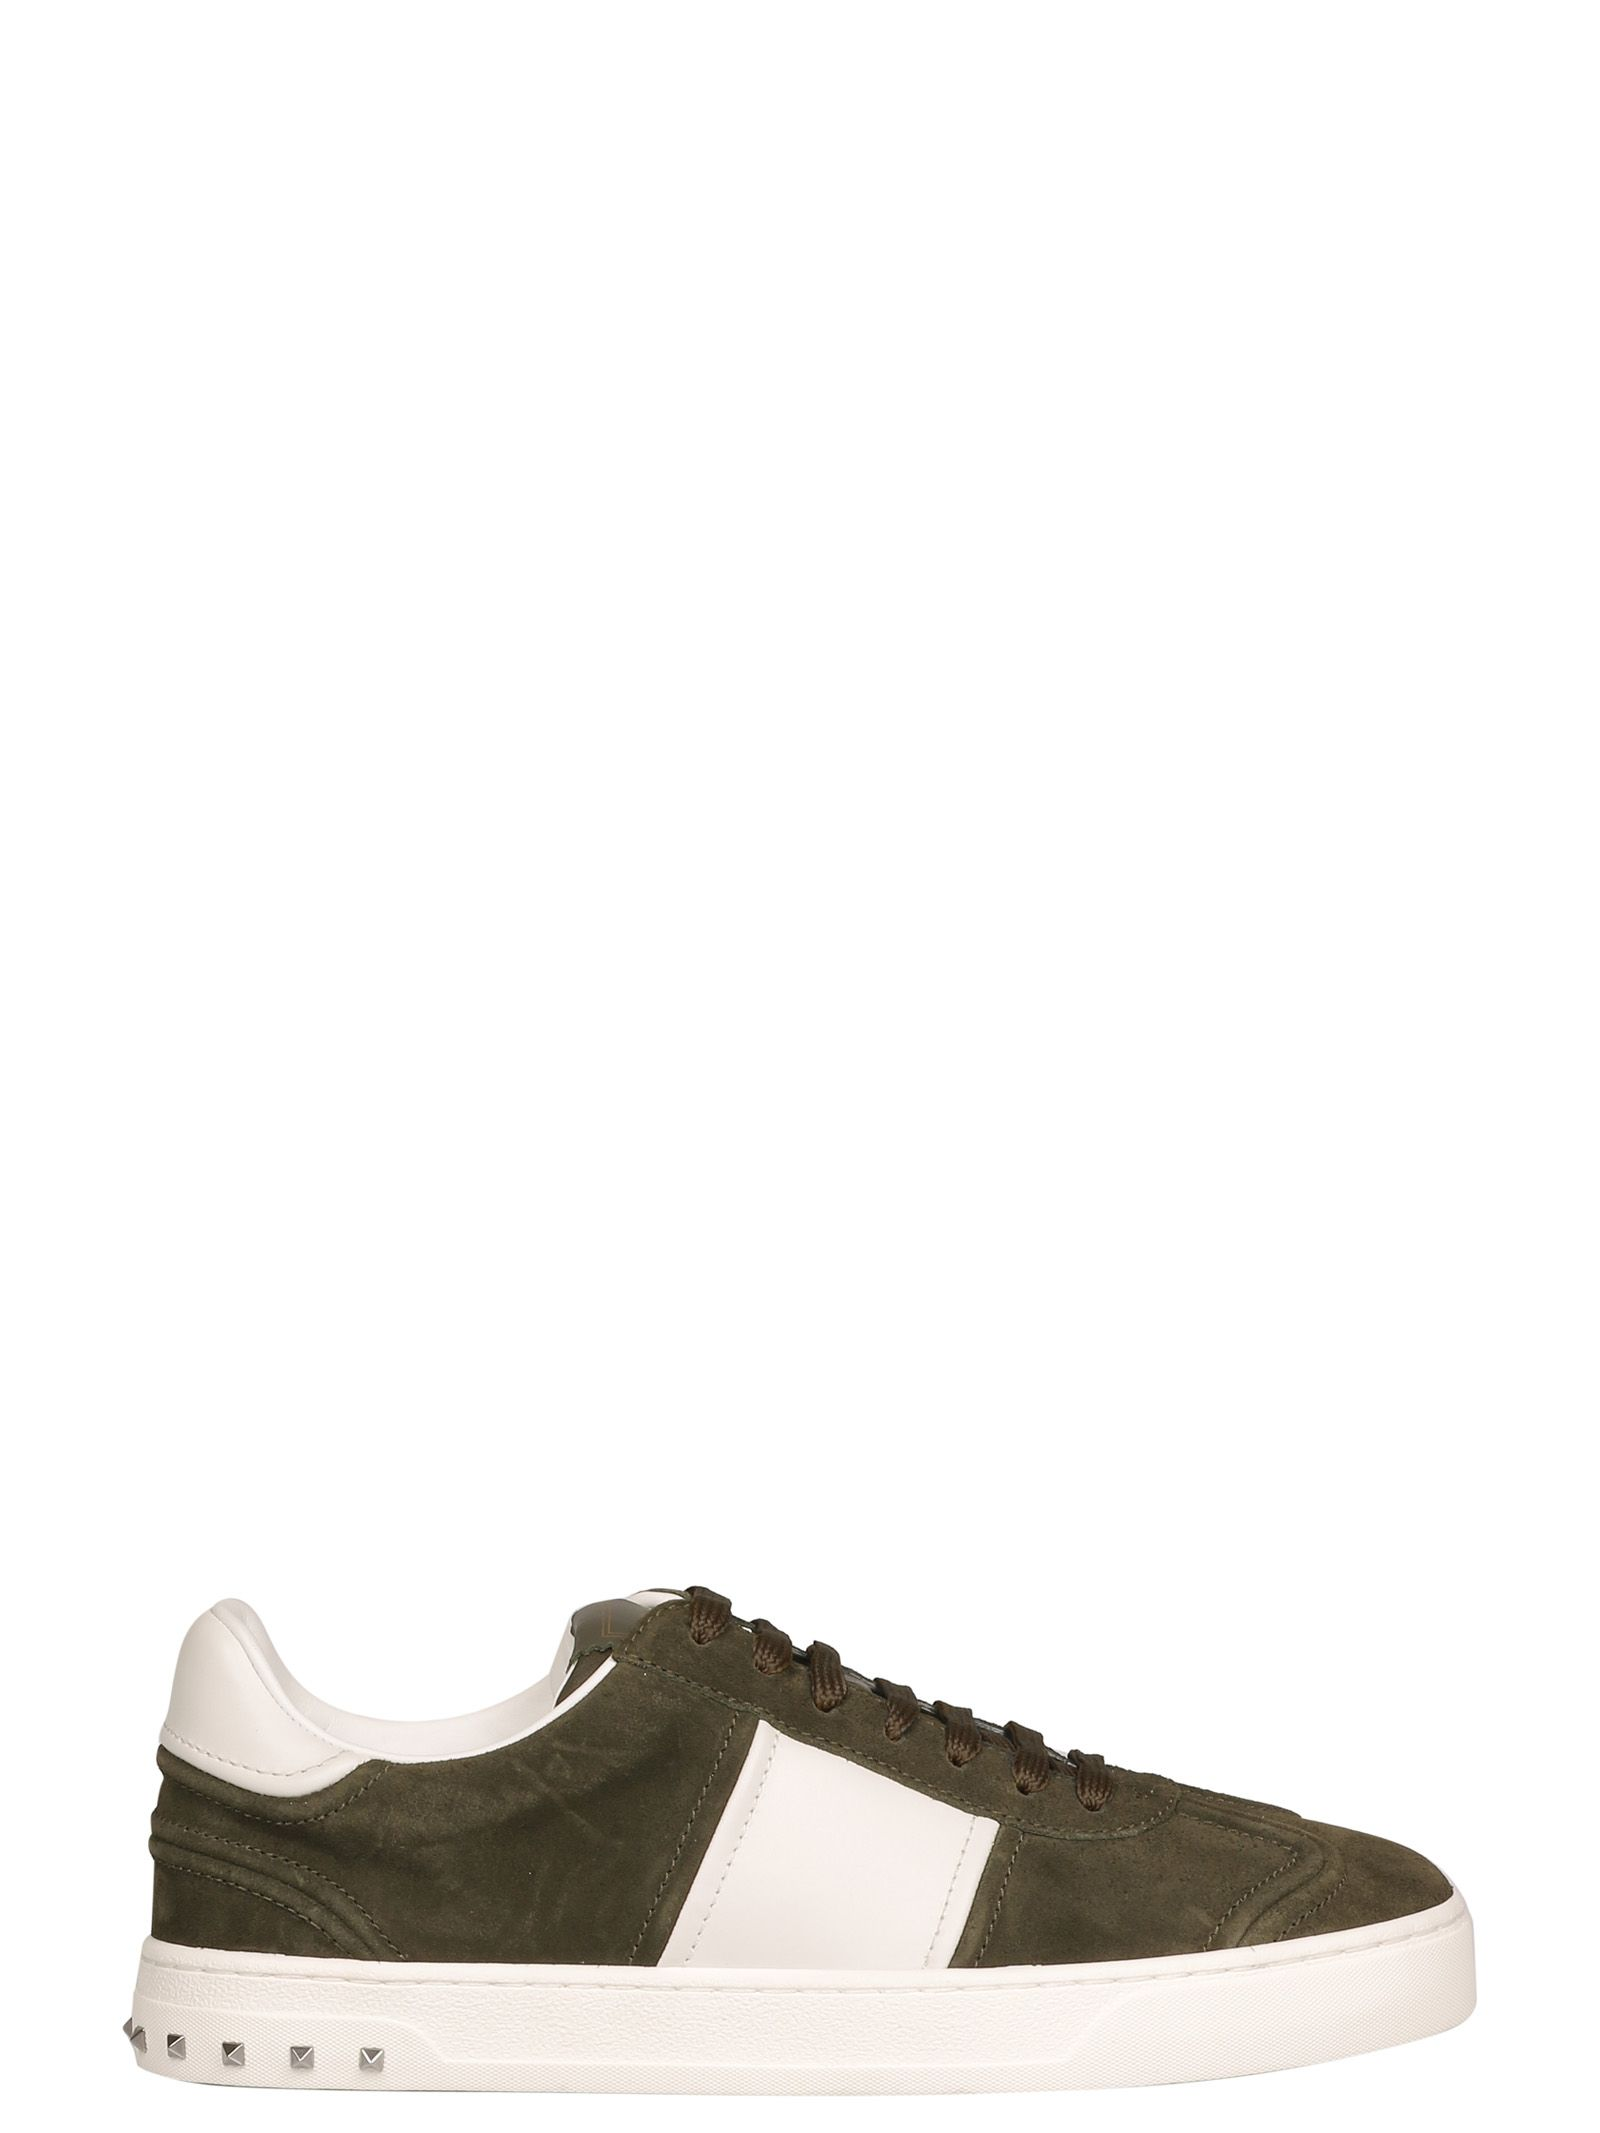 Valentino Garavani Fly Crew Sneakers